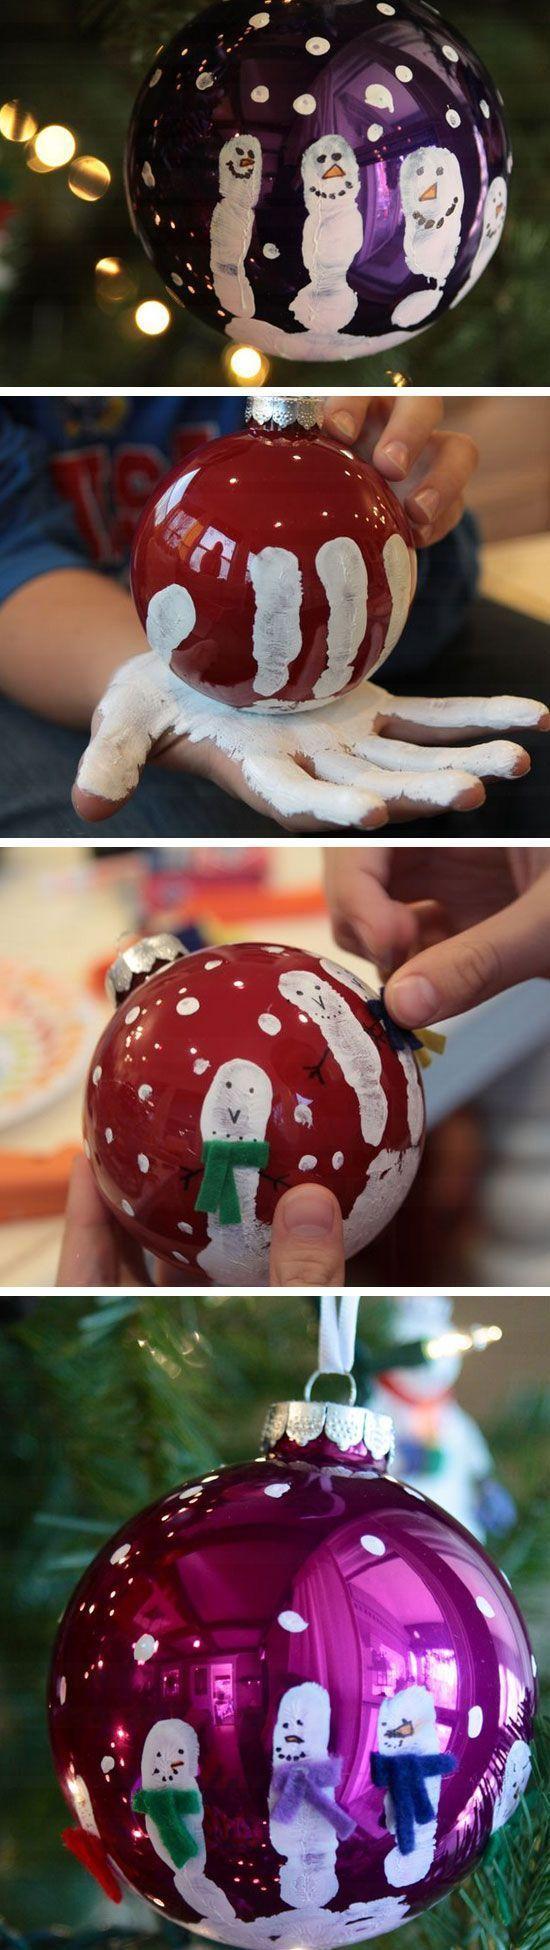 DIY Craft: DIY Christmas Craft Ideas for Kids - Easy Handprint Ornament for kids to make <a class=